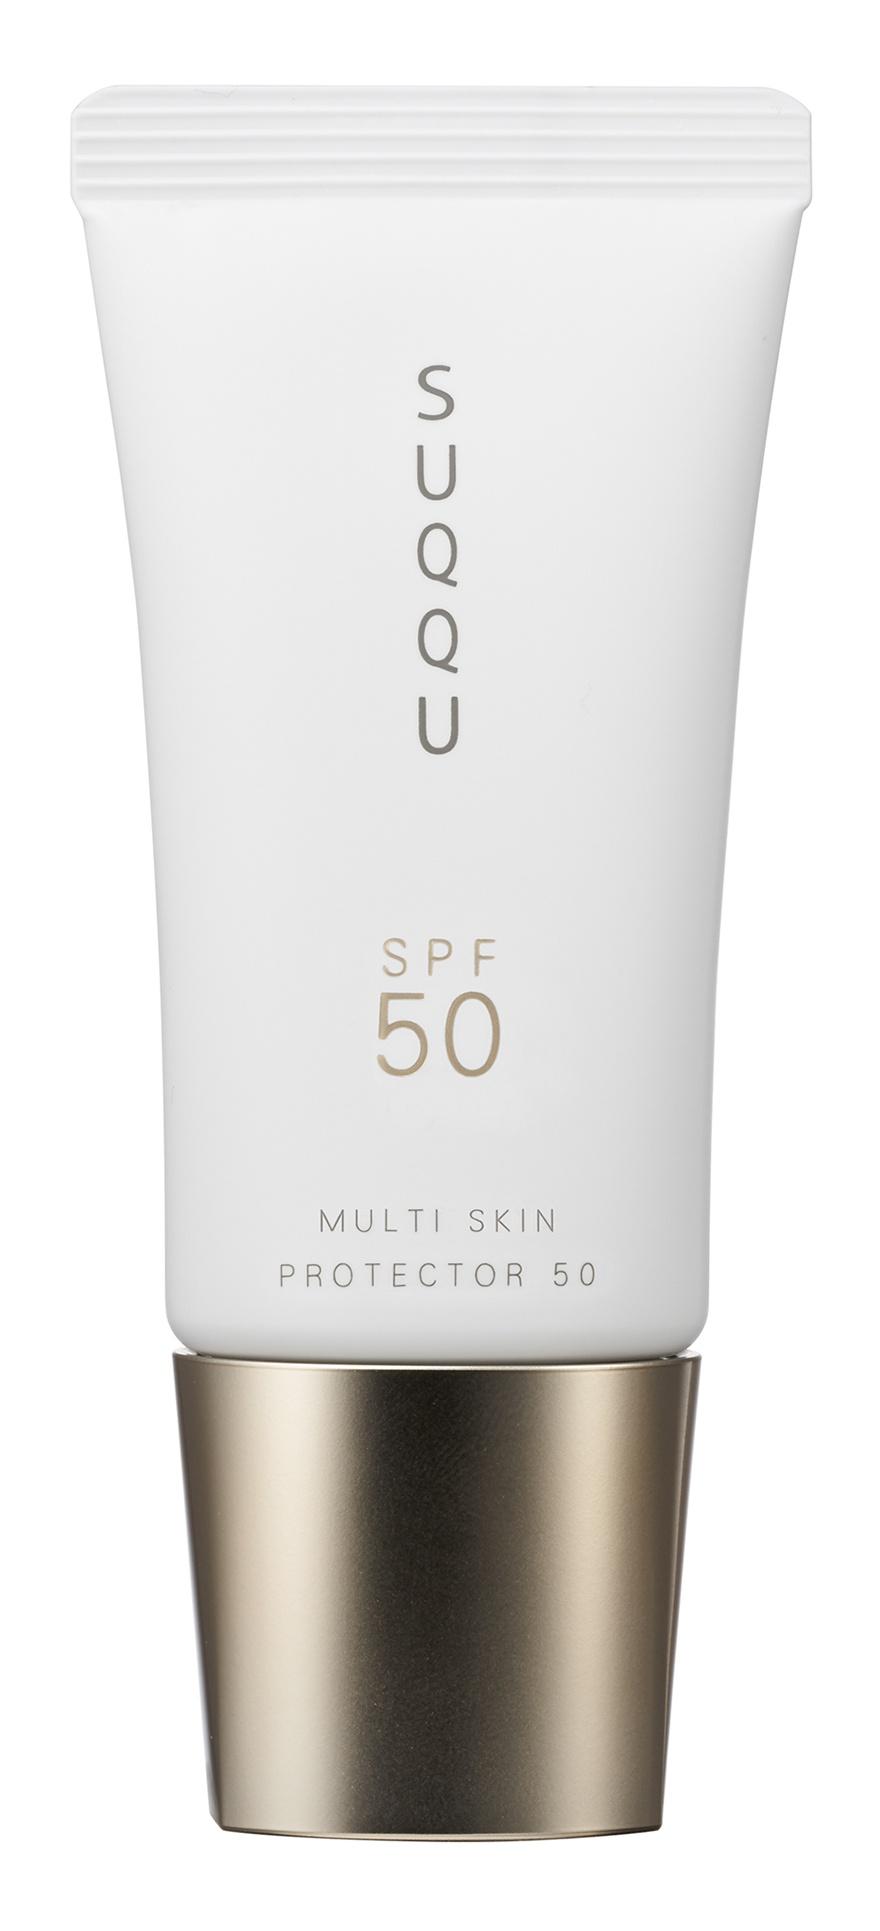 Suqqu Multi Skin Protector SPF 50